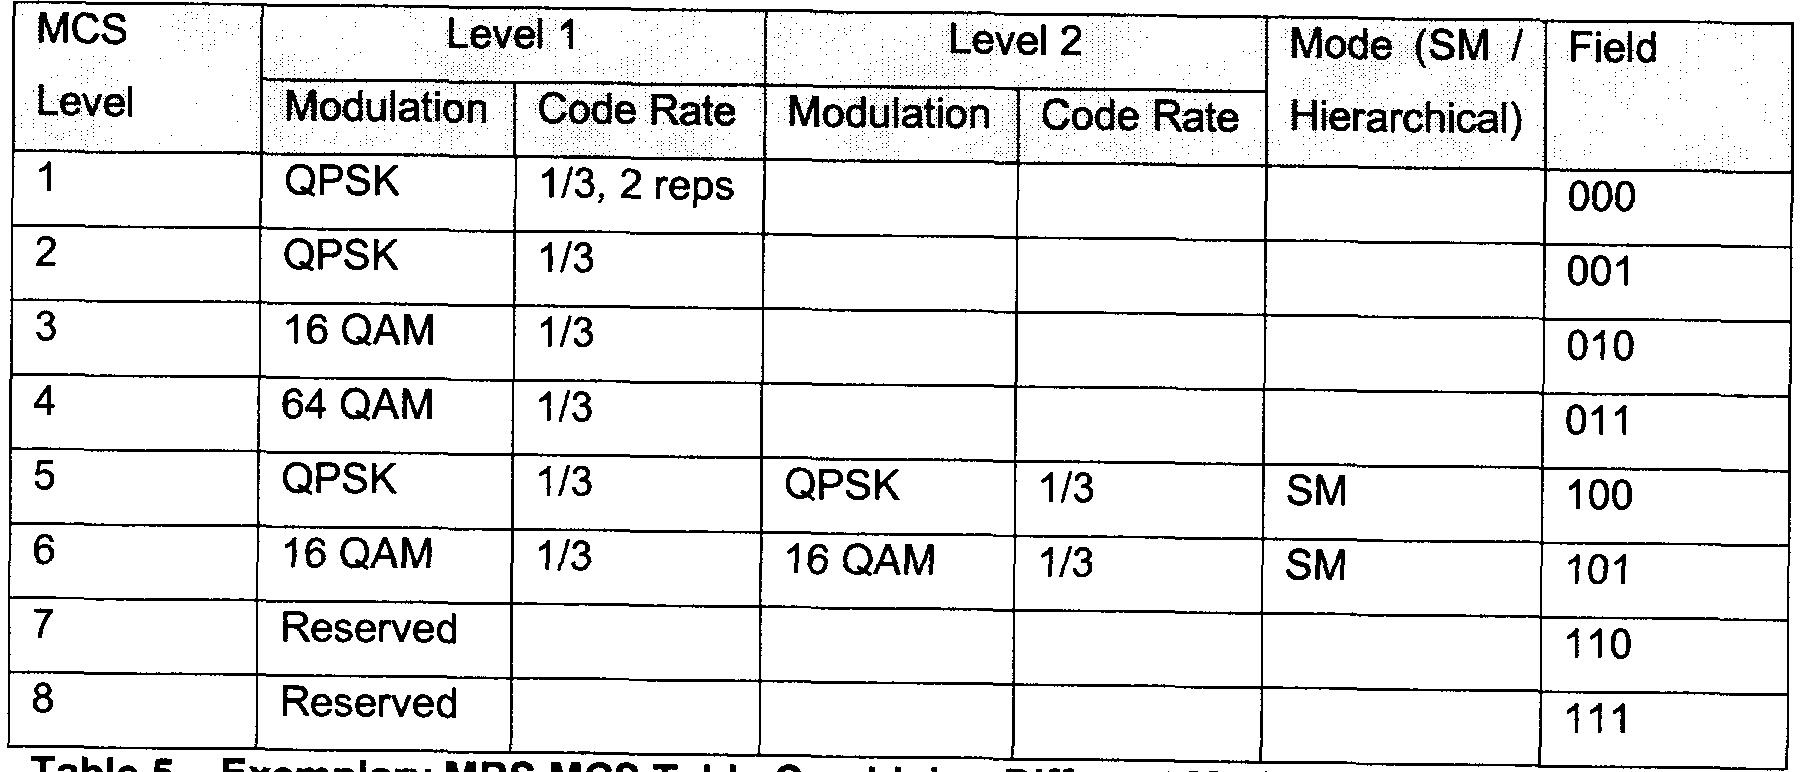 Mode of transmission-4089